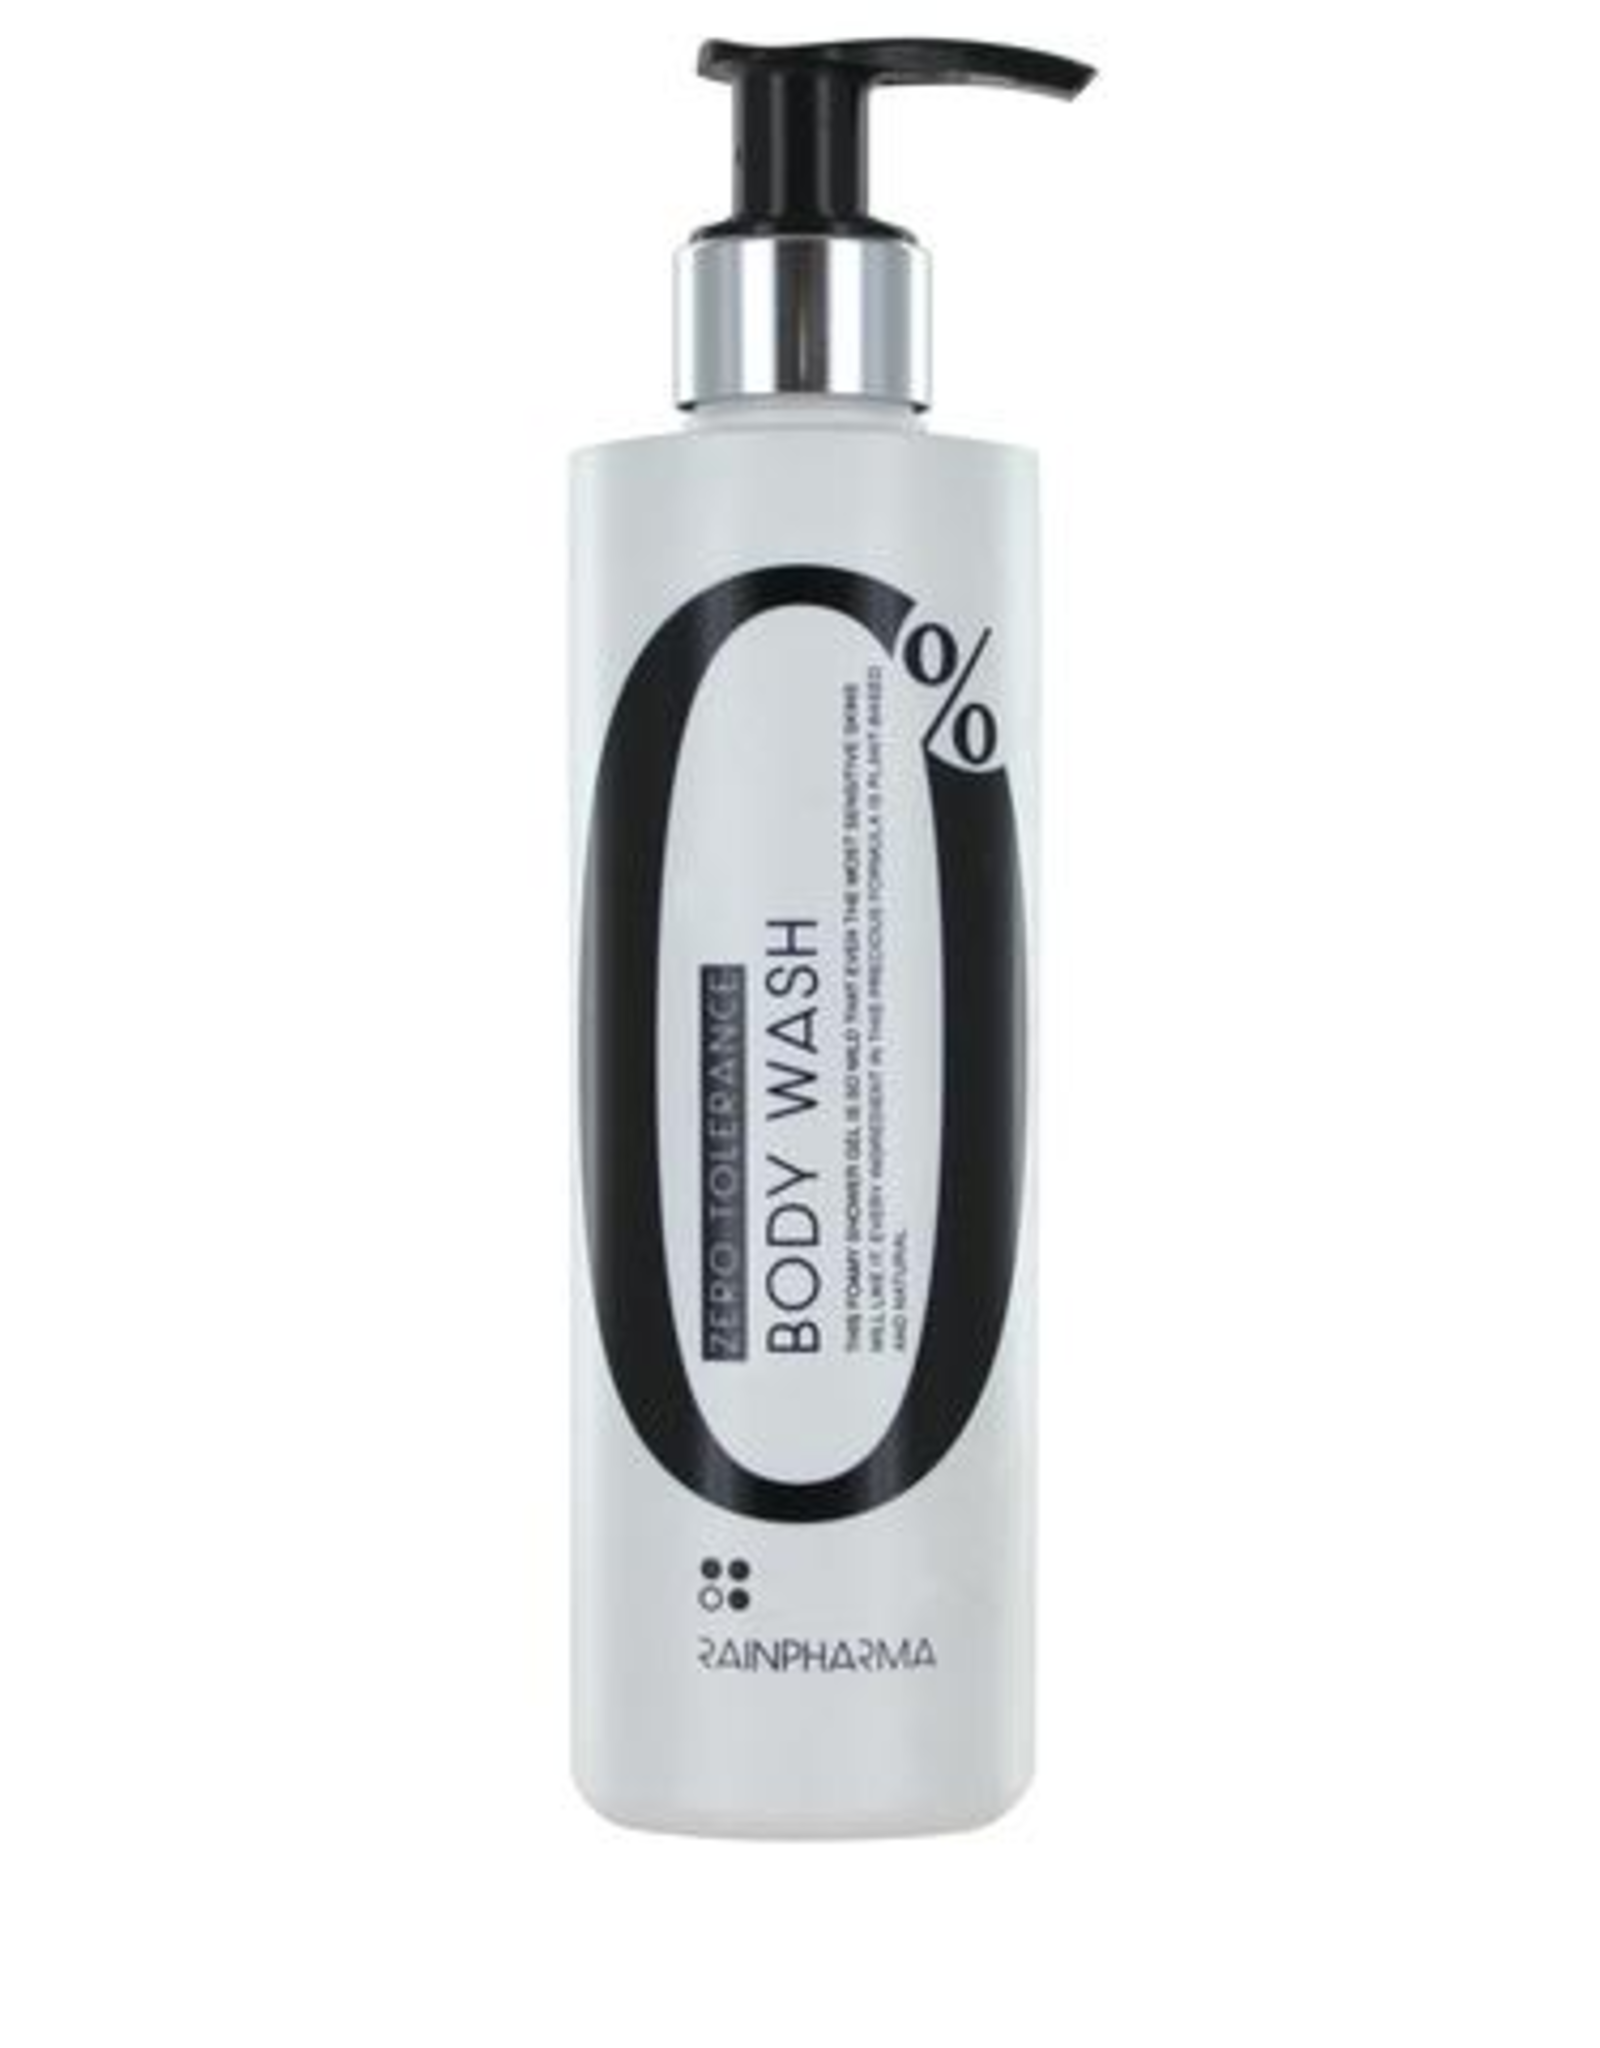 RainPharma Rainpharma - Zero Tolerance Body Wash 250ml